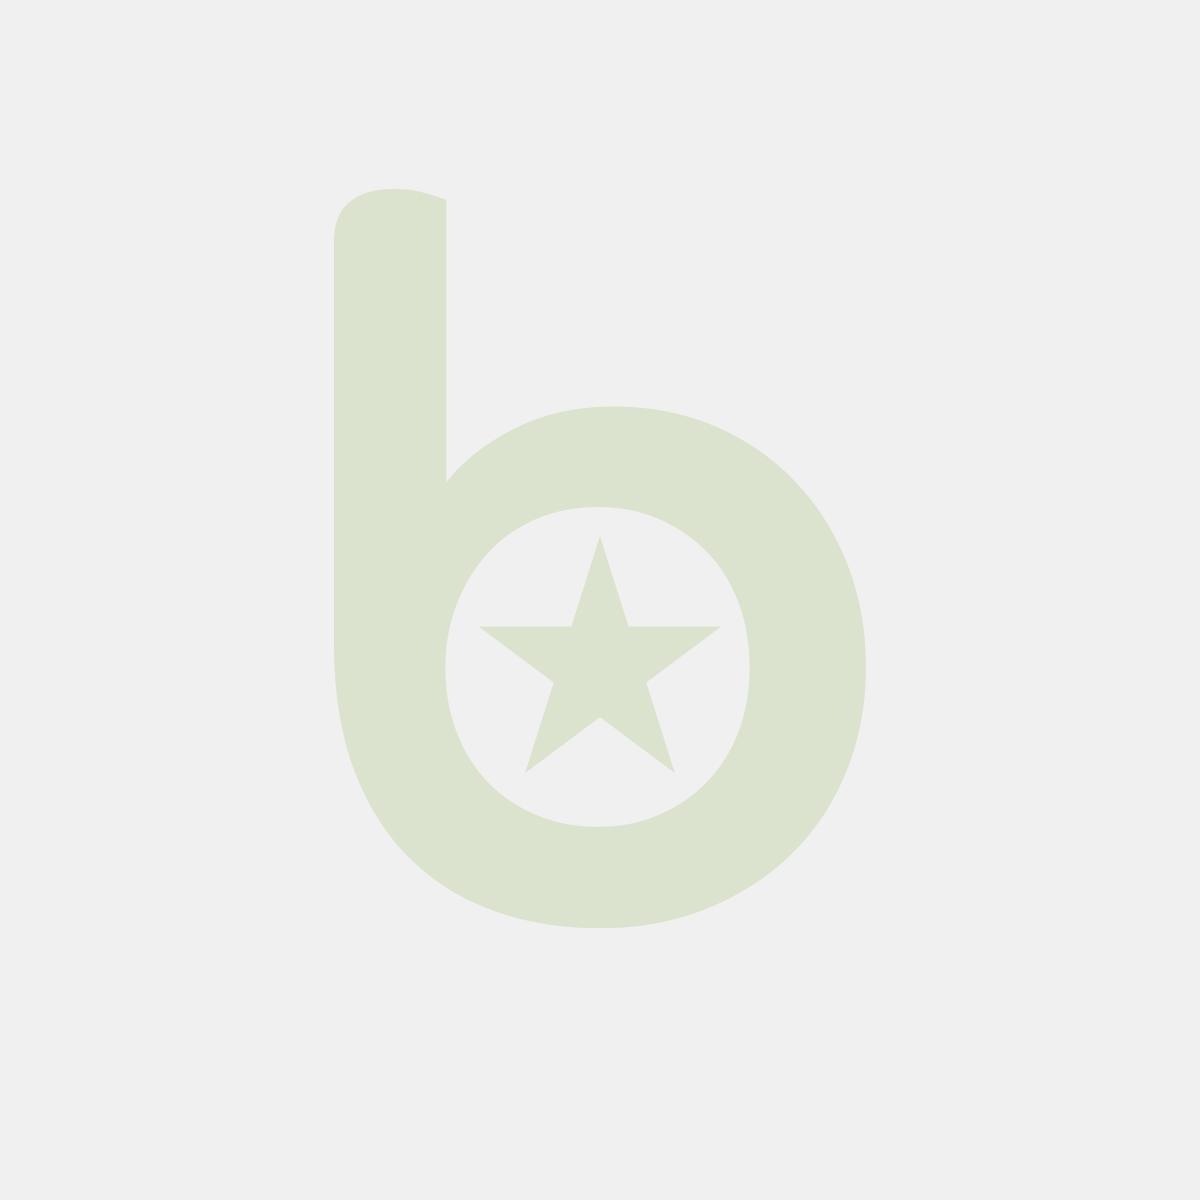 Obrus PAPSTAR Royal Collection 120x180 c.zieleń